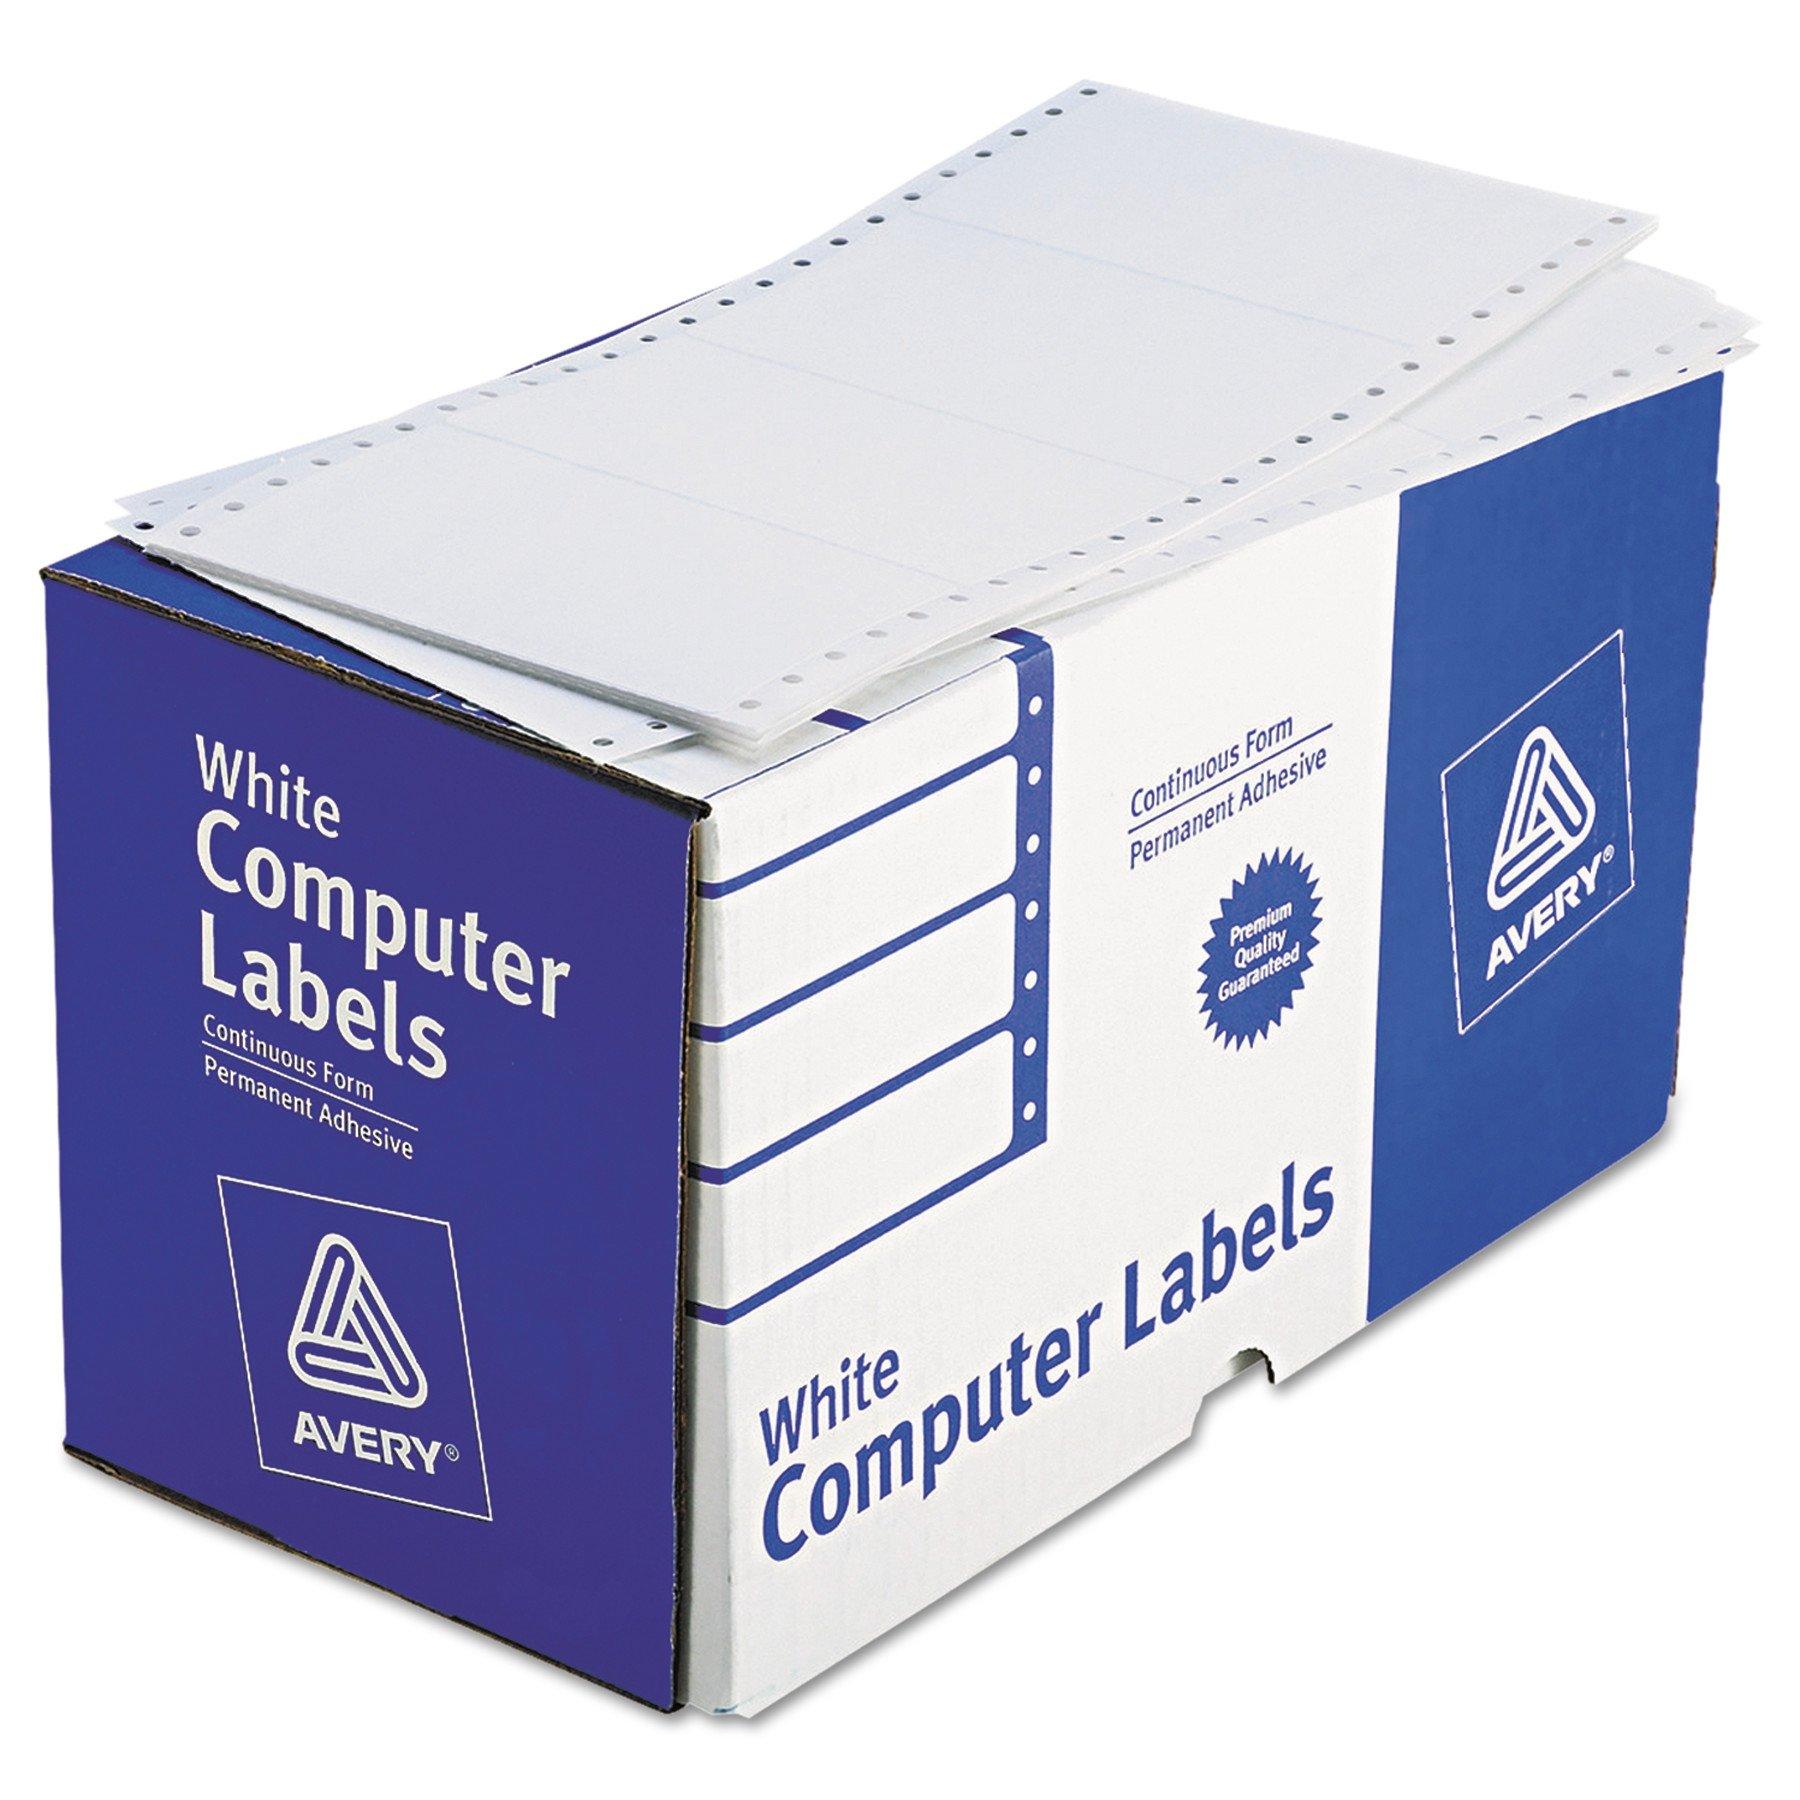 Avery 4076 Dot Matrix Printer Shipping Labels, 1 Across, 2 15/16 x 5, White (Box of 3000) by AVERY